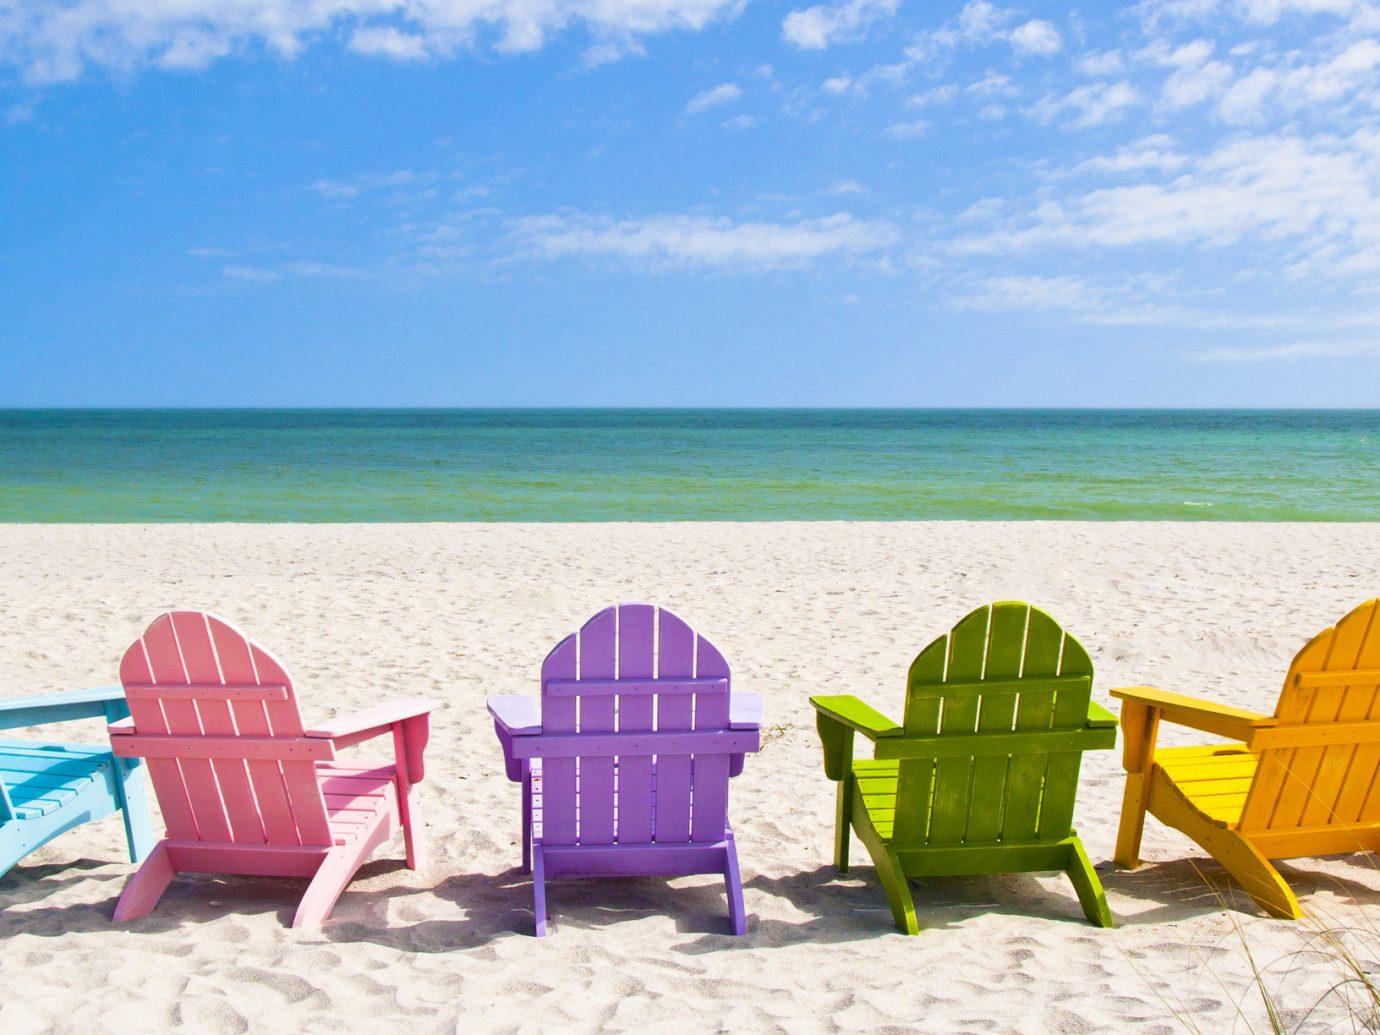 Trip Ideas outdoor sky ground chair Beach vacation Sea summer shore tourism leisure sand Ocean caribbean lawn water fun sun tanning